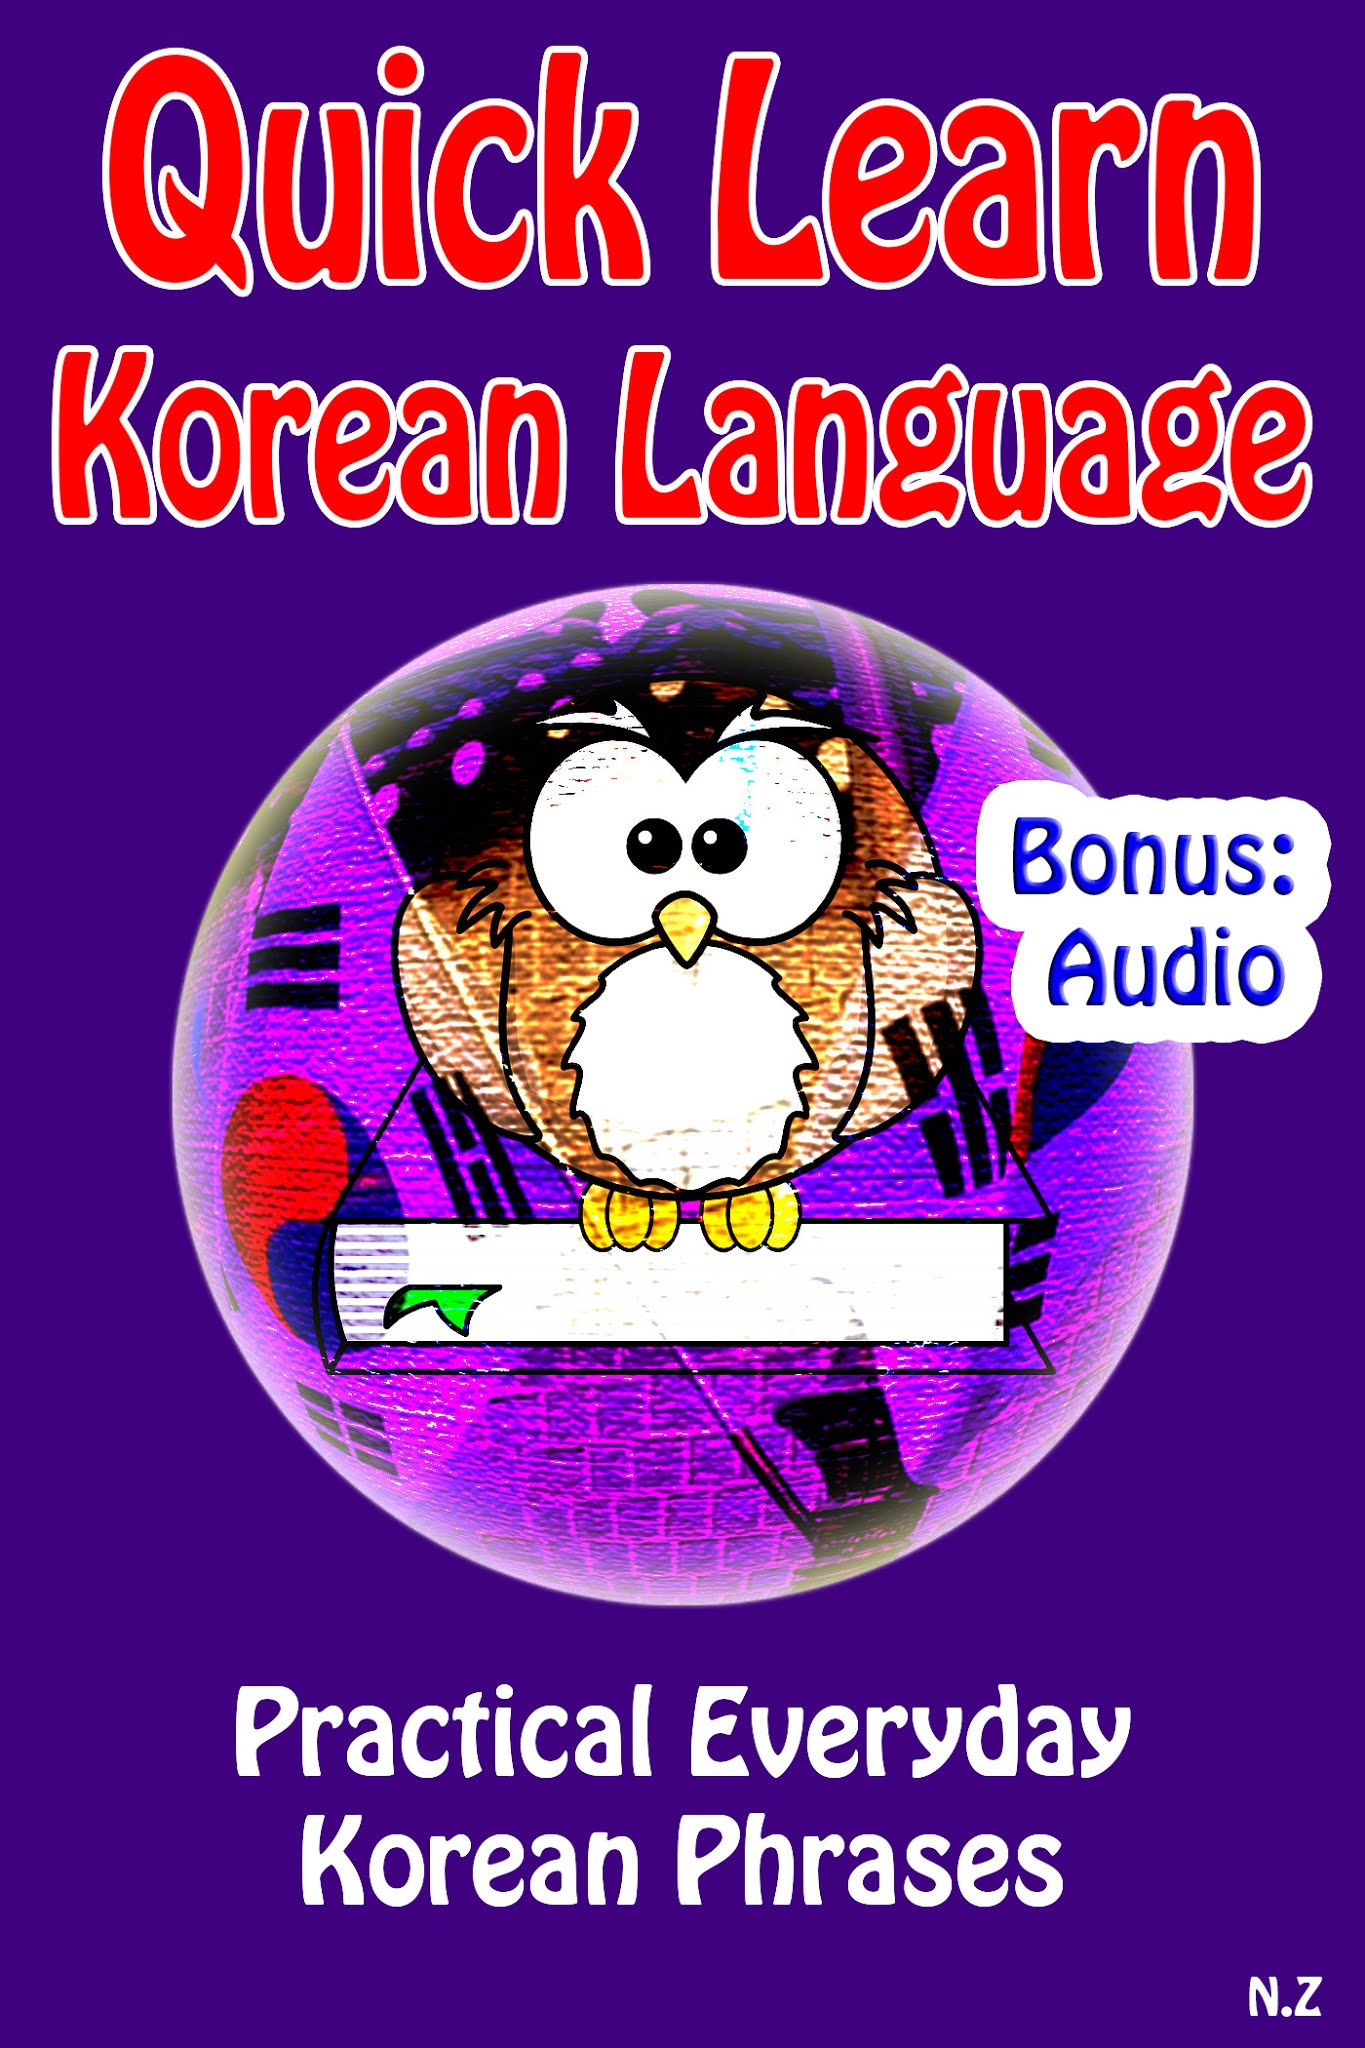 Quick Learn Korean Language: Practical Everyday Korean Phrases